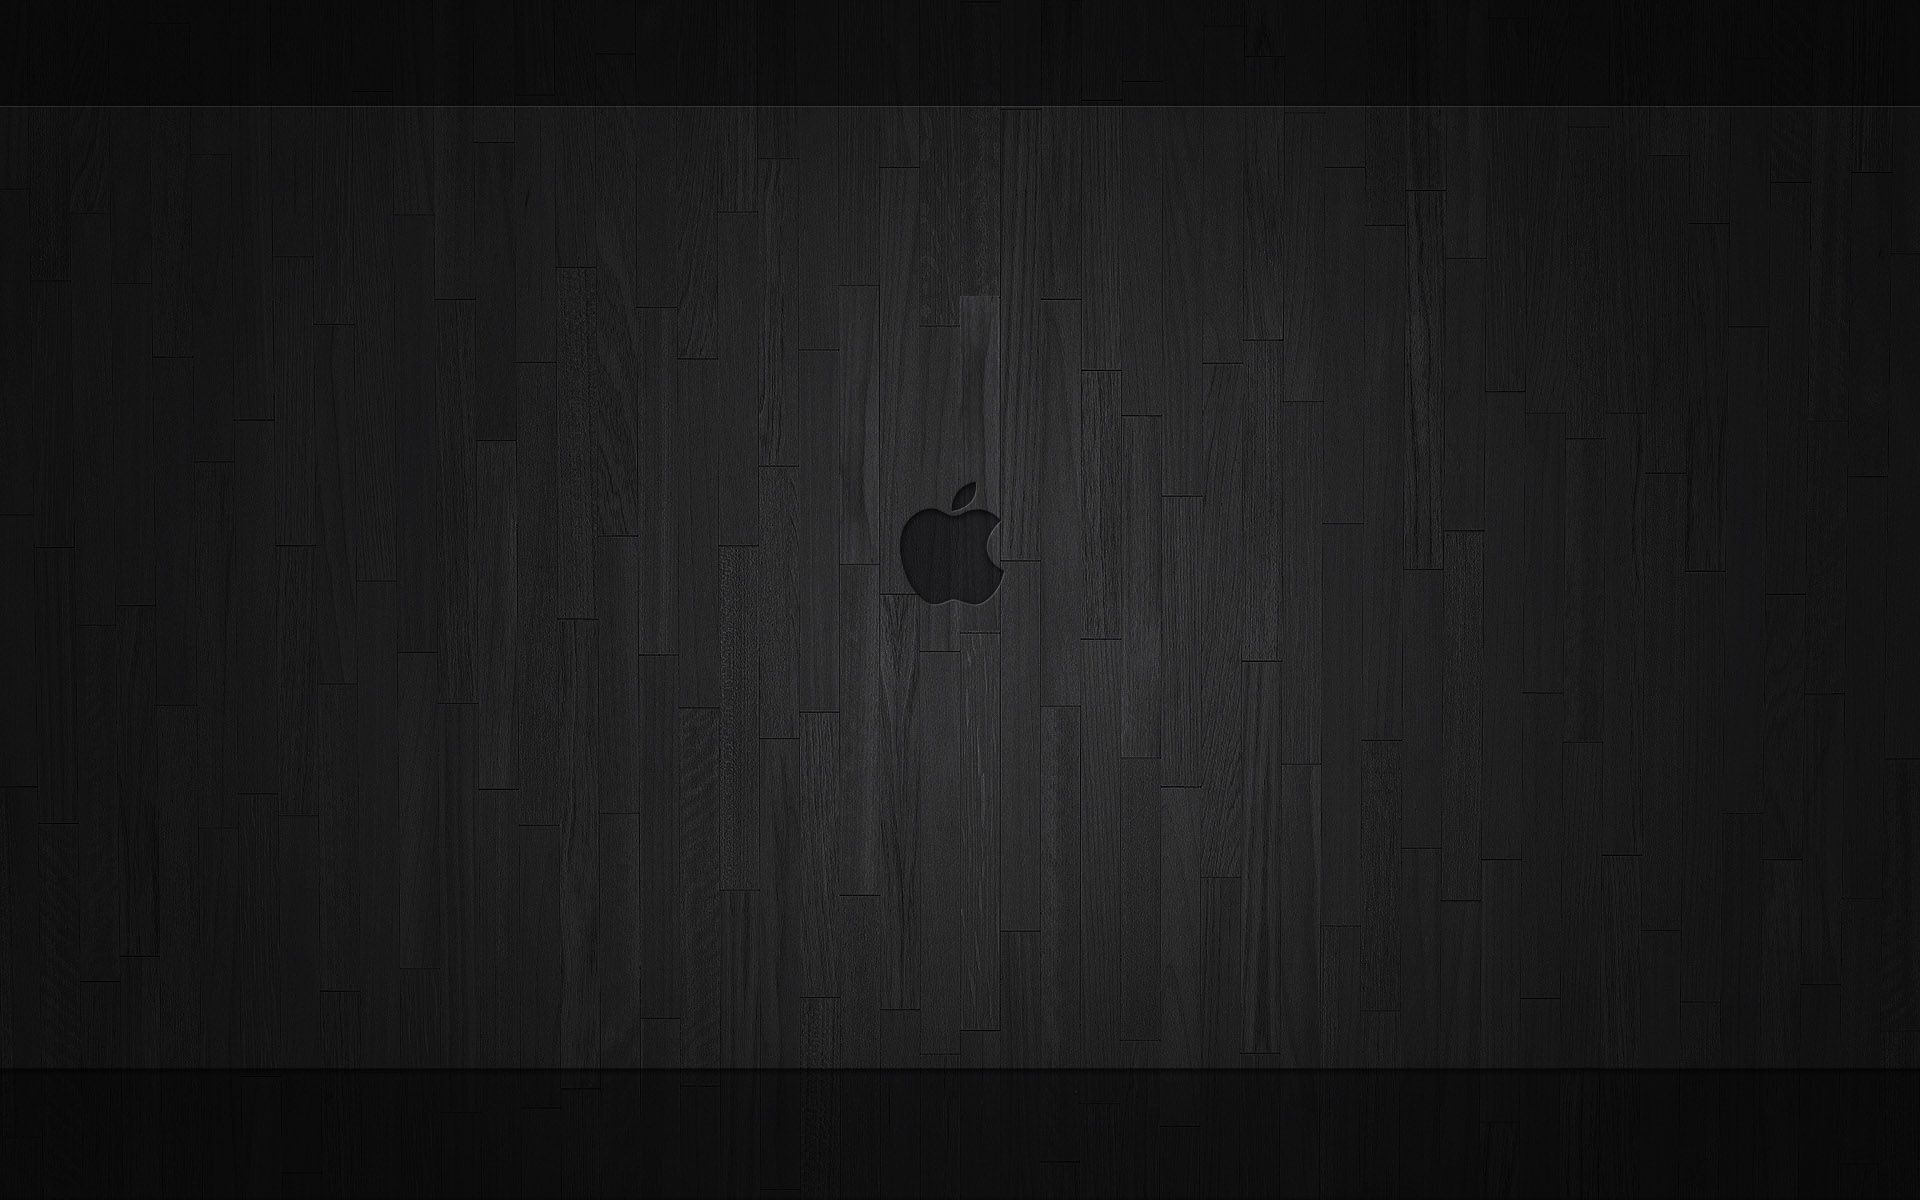 Aapple Black Background Mac Wallpaper Download Free Mac 1920